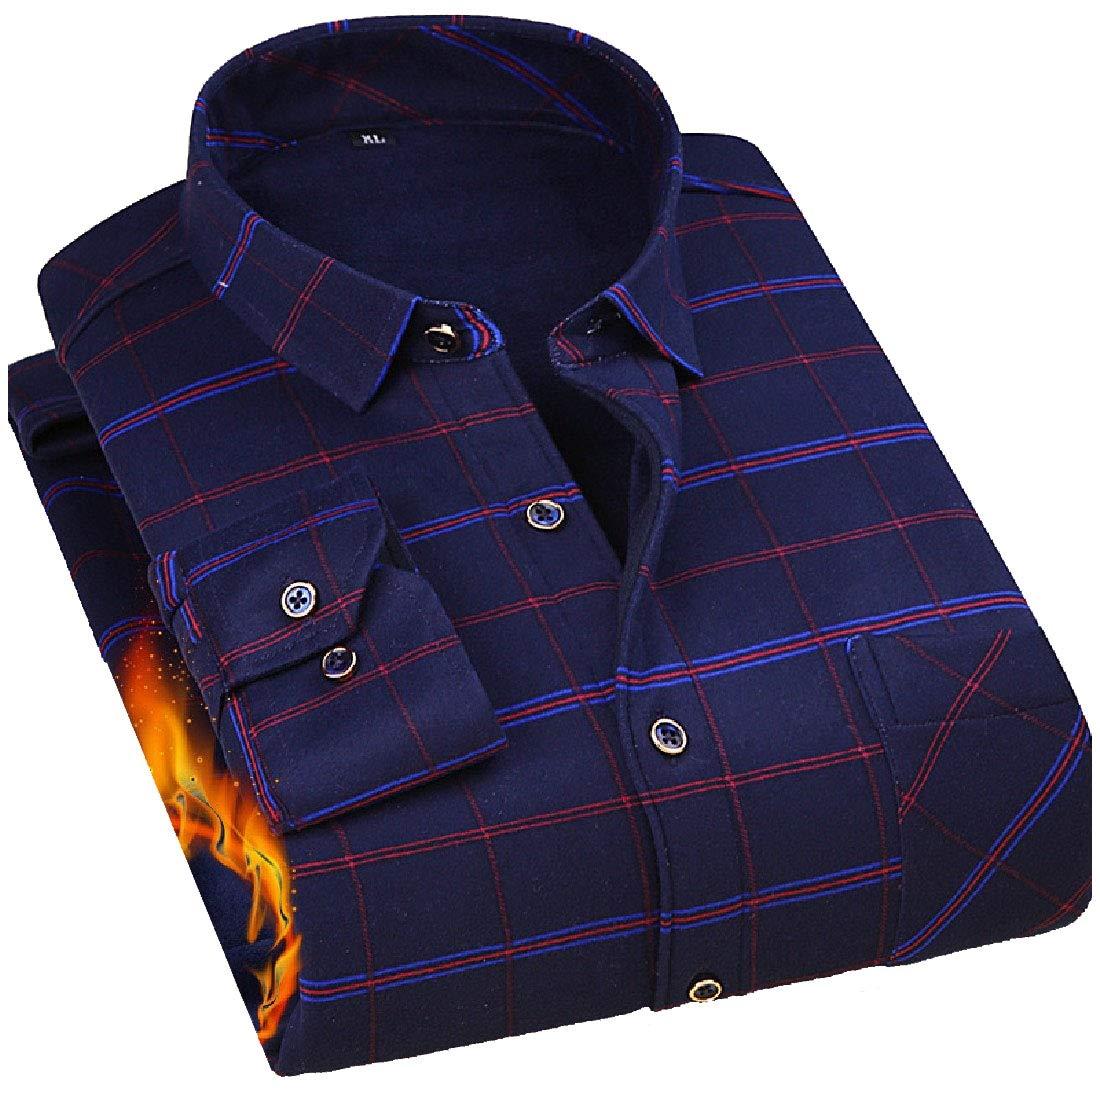 YUNY Men Leisure Warm Long Sleeve Button Turn-Down Collar Work Shirt AS2 XL